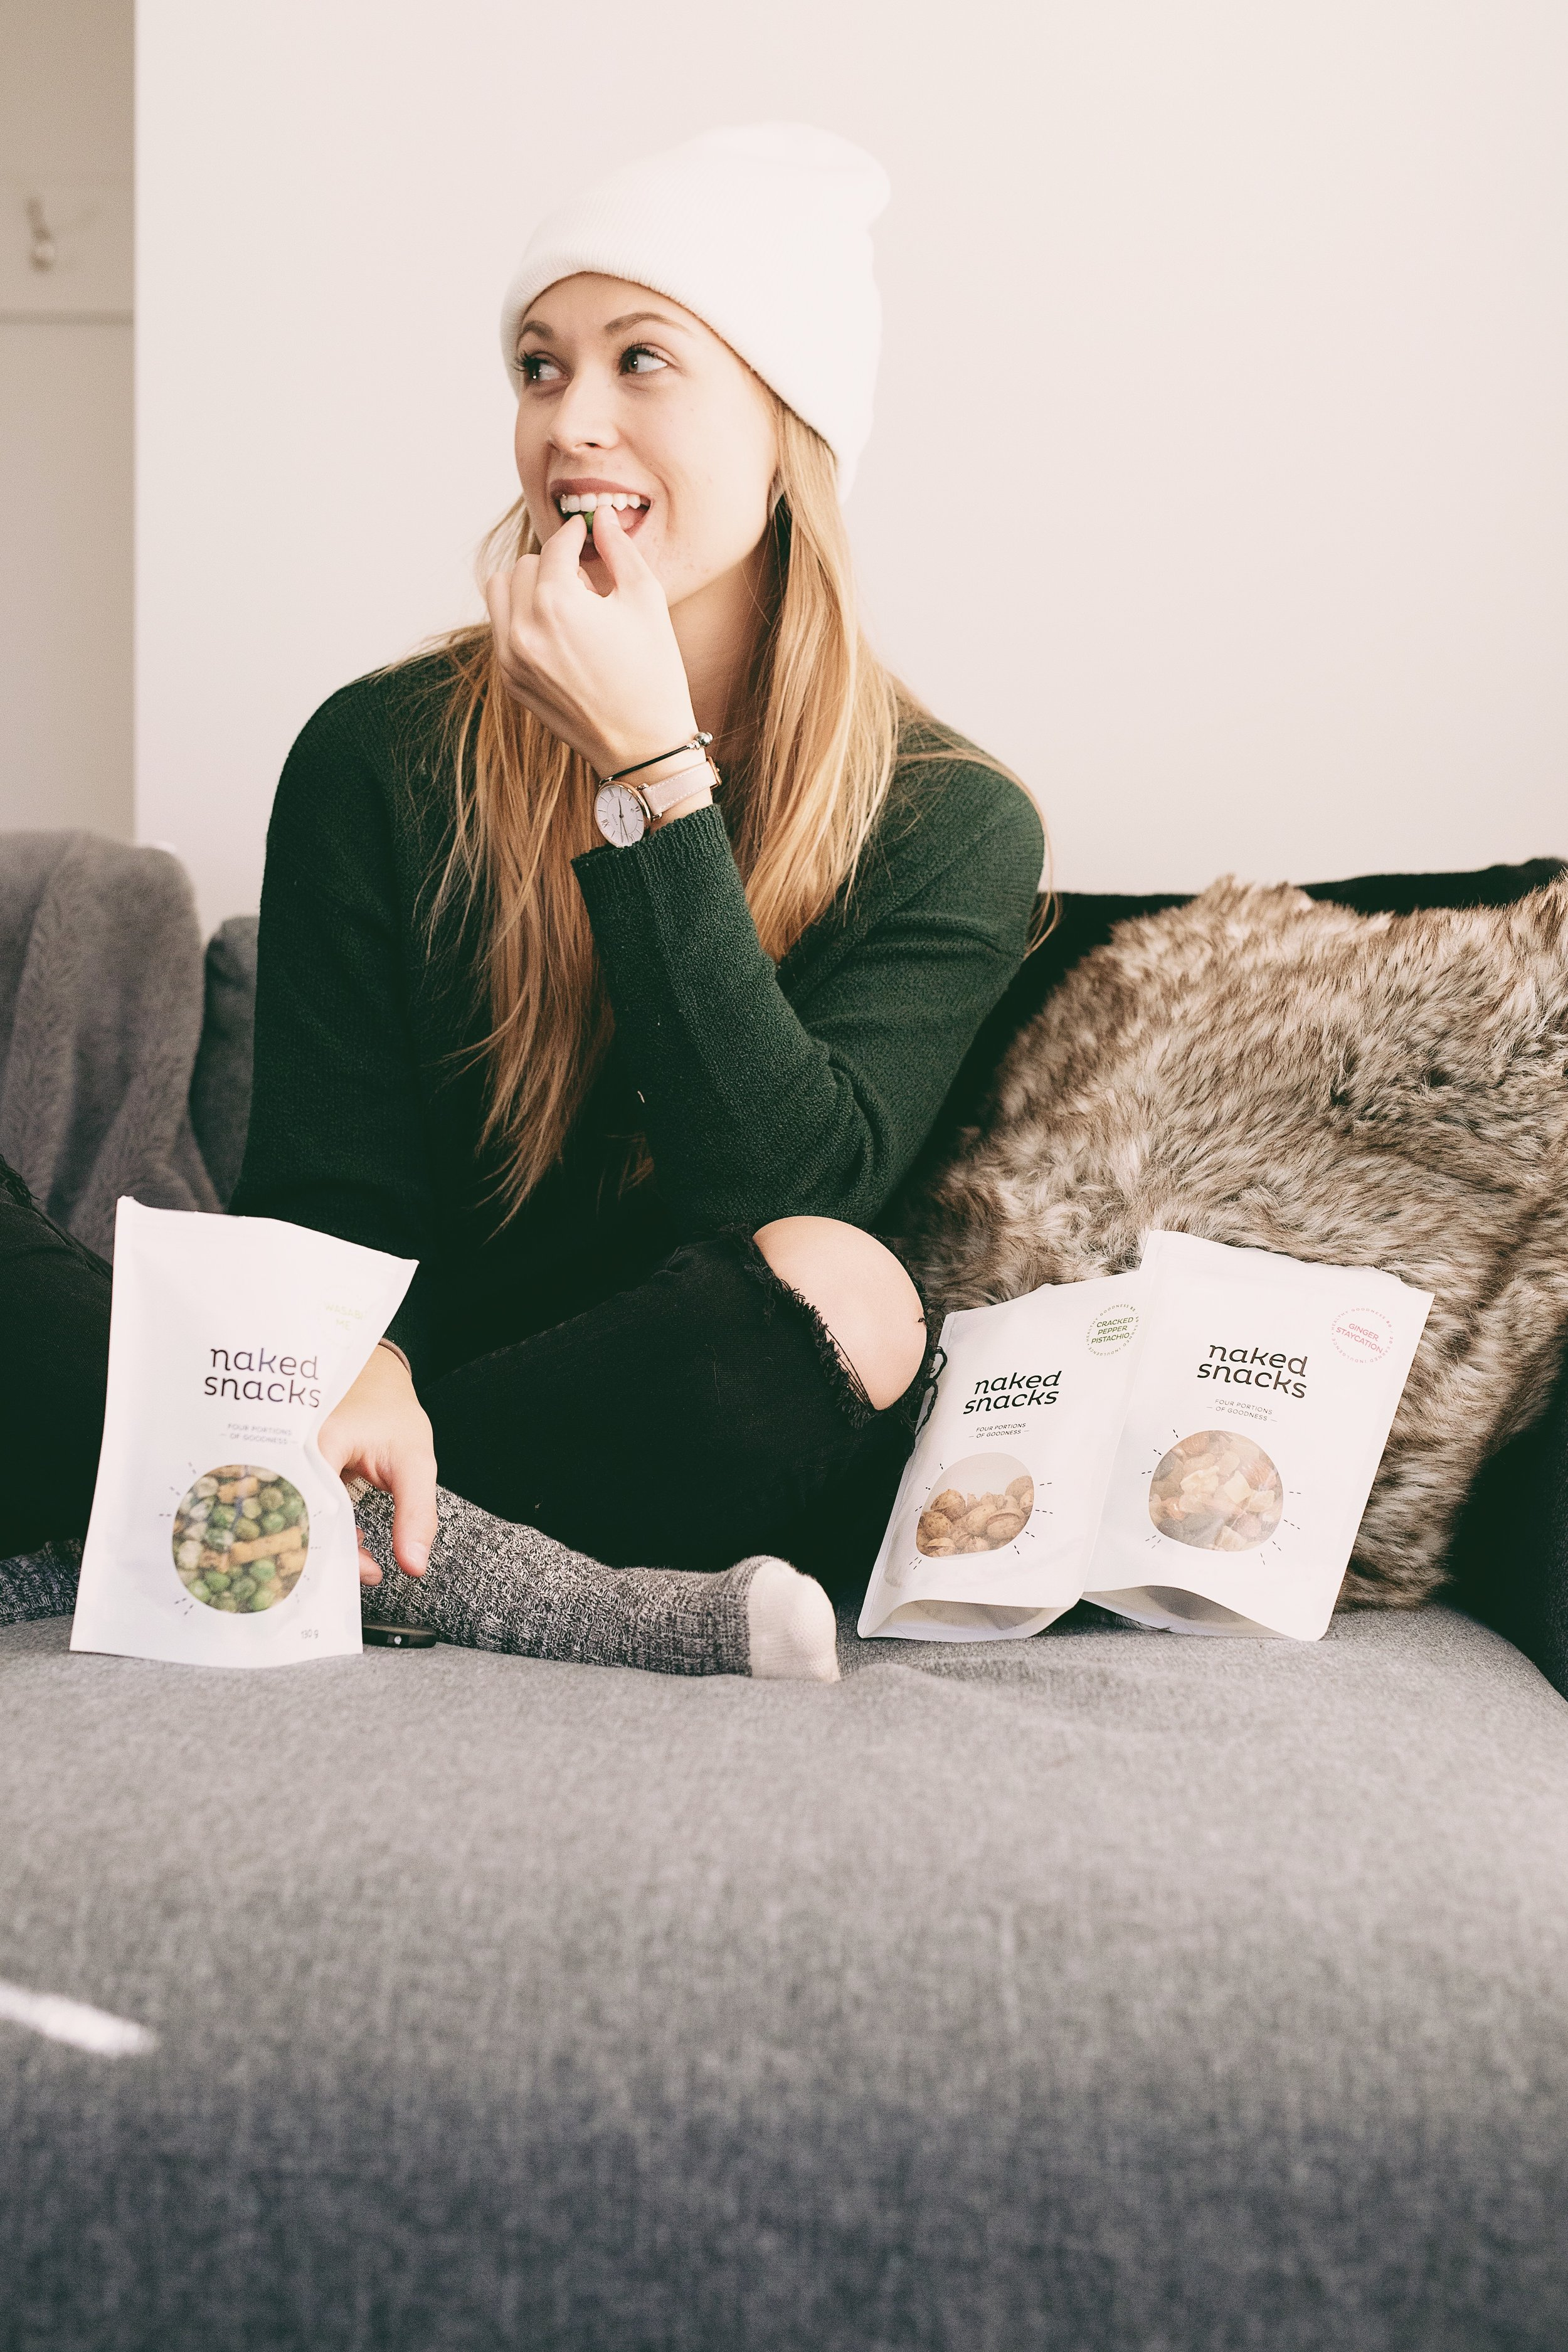 naked-snacks-vancouver